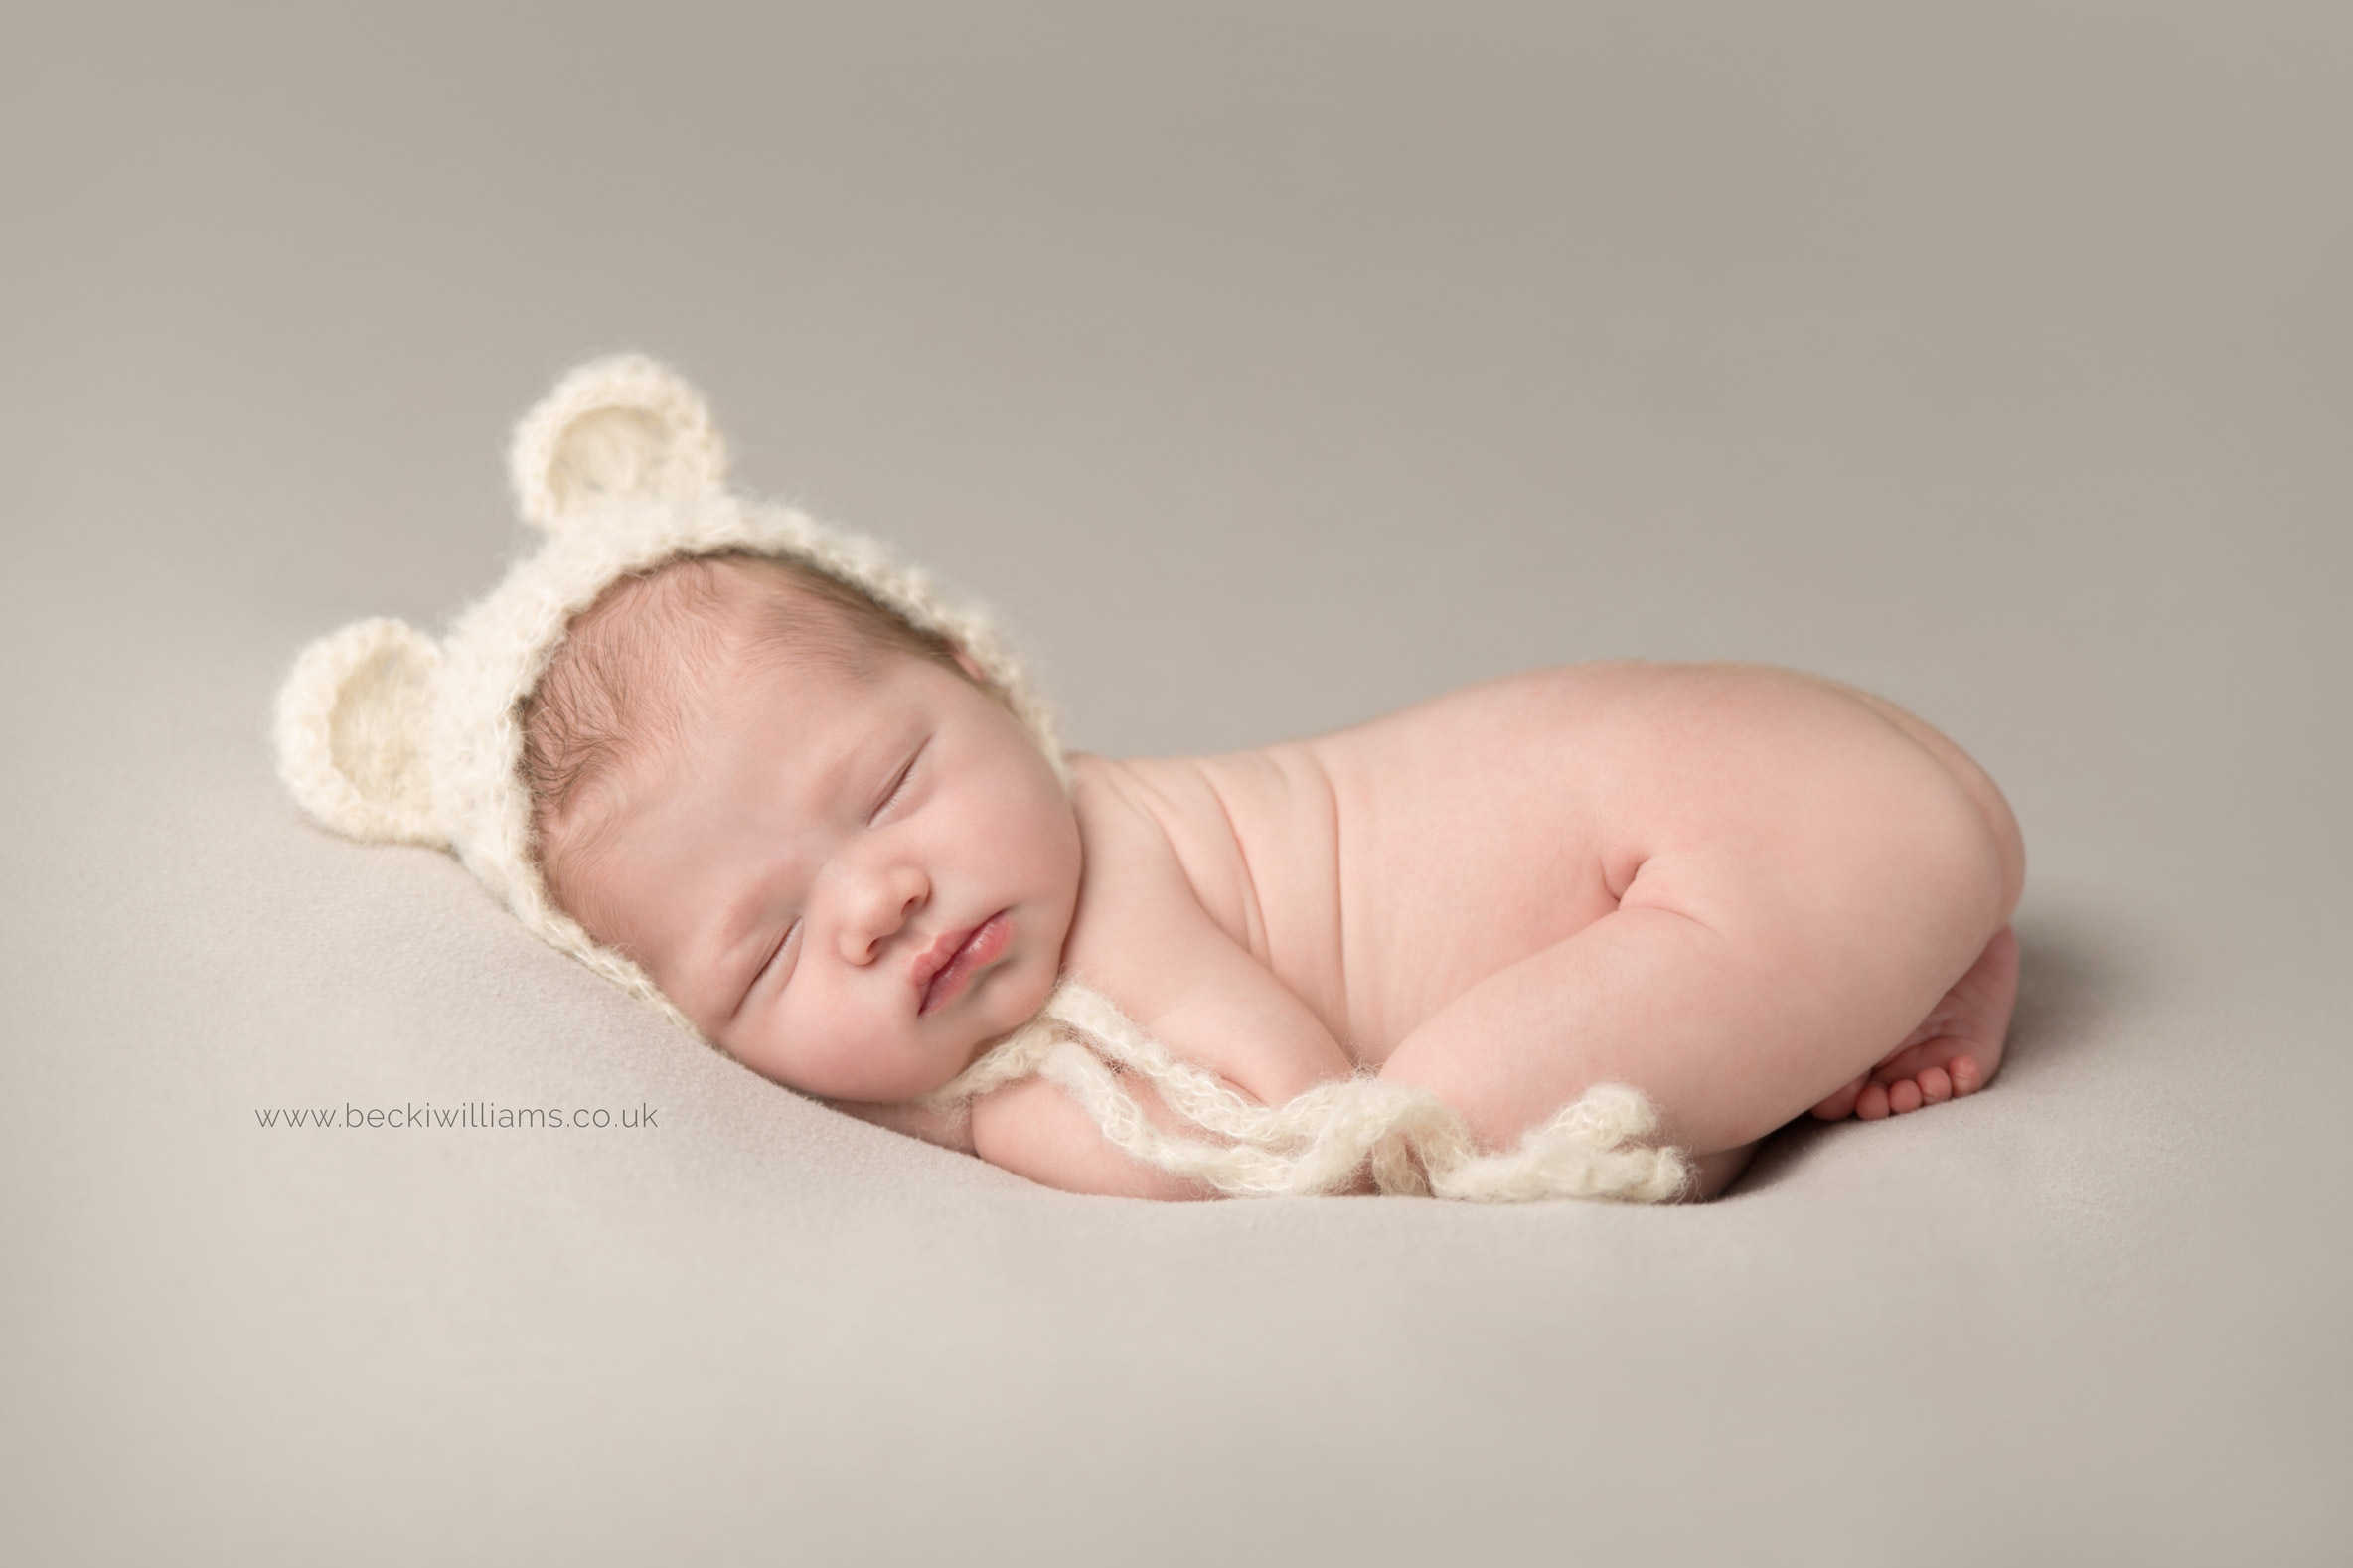 professional photo shoot of newborn baby in hemel hempstead. baby laying on it's tummy wearing a cute bear hat.